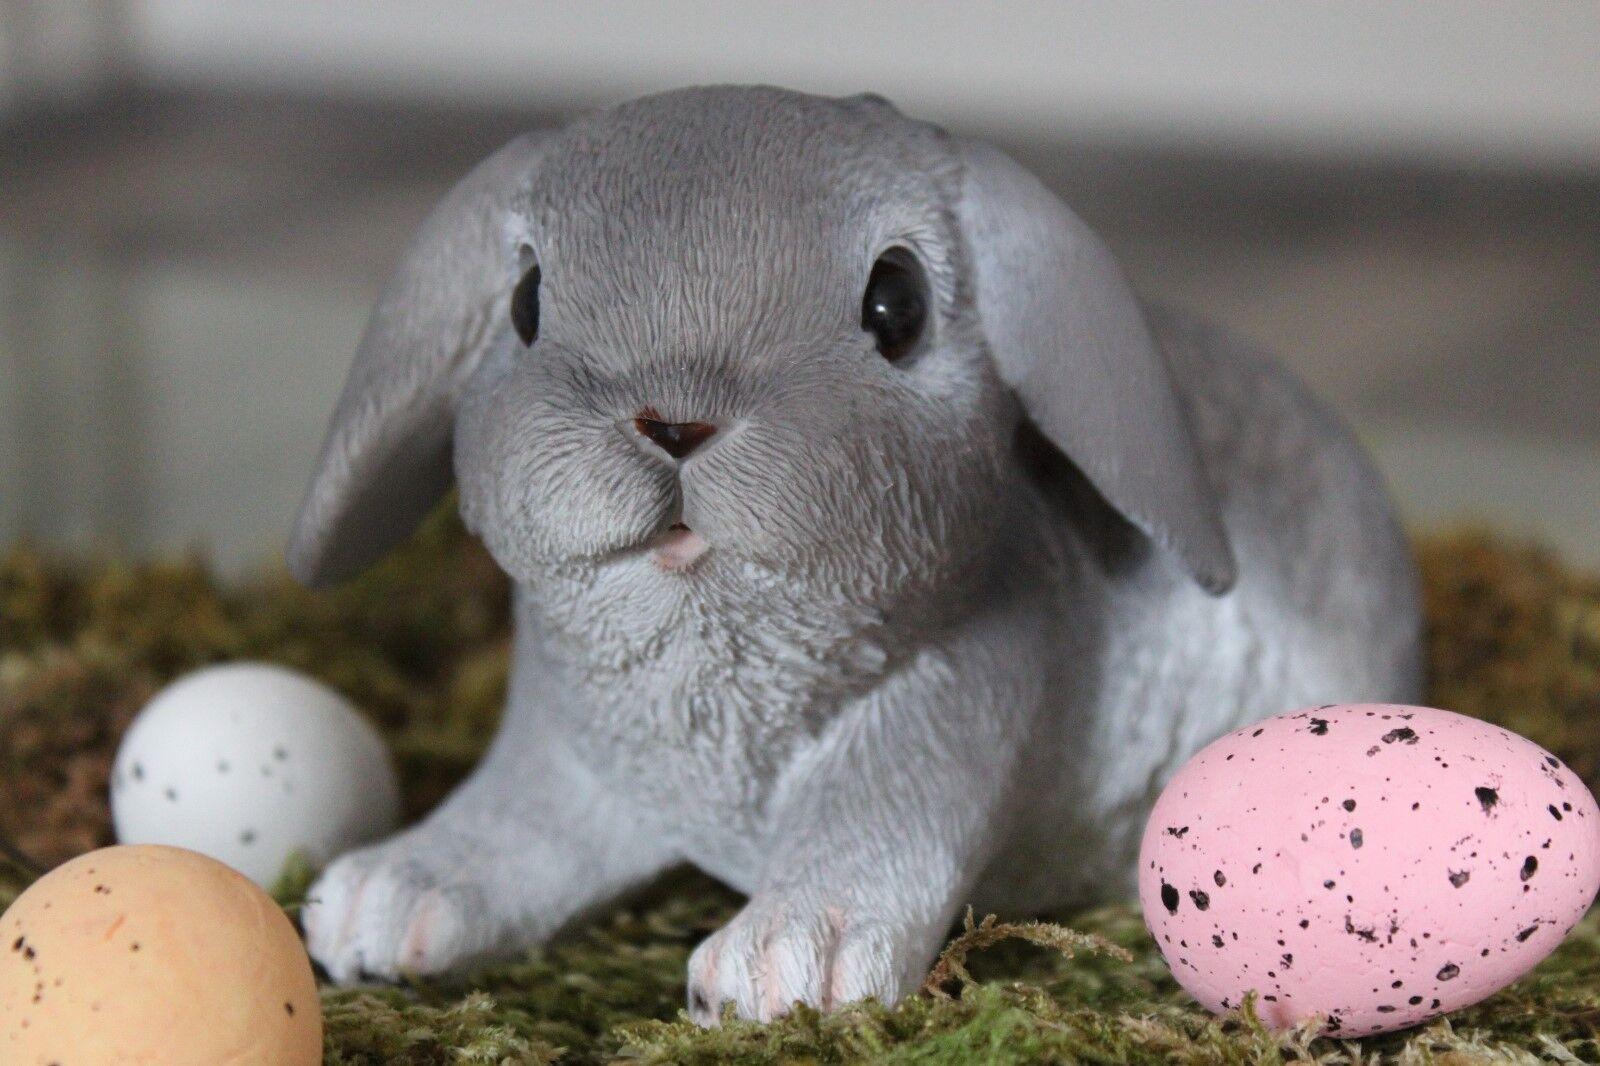 Deko Hase braun grau Gartenfigur Figur Ostern Tier Lebensecht Kaninchen Oster